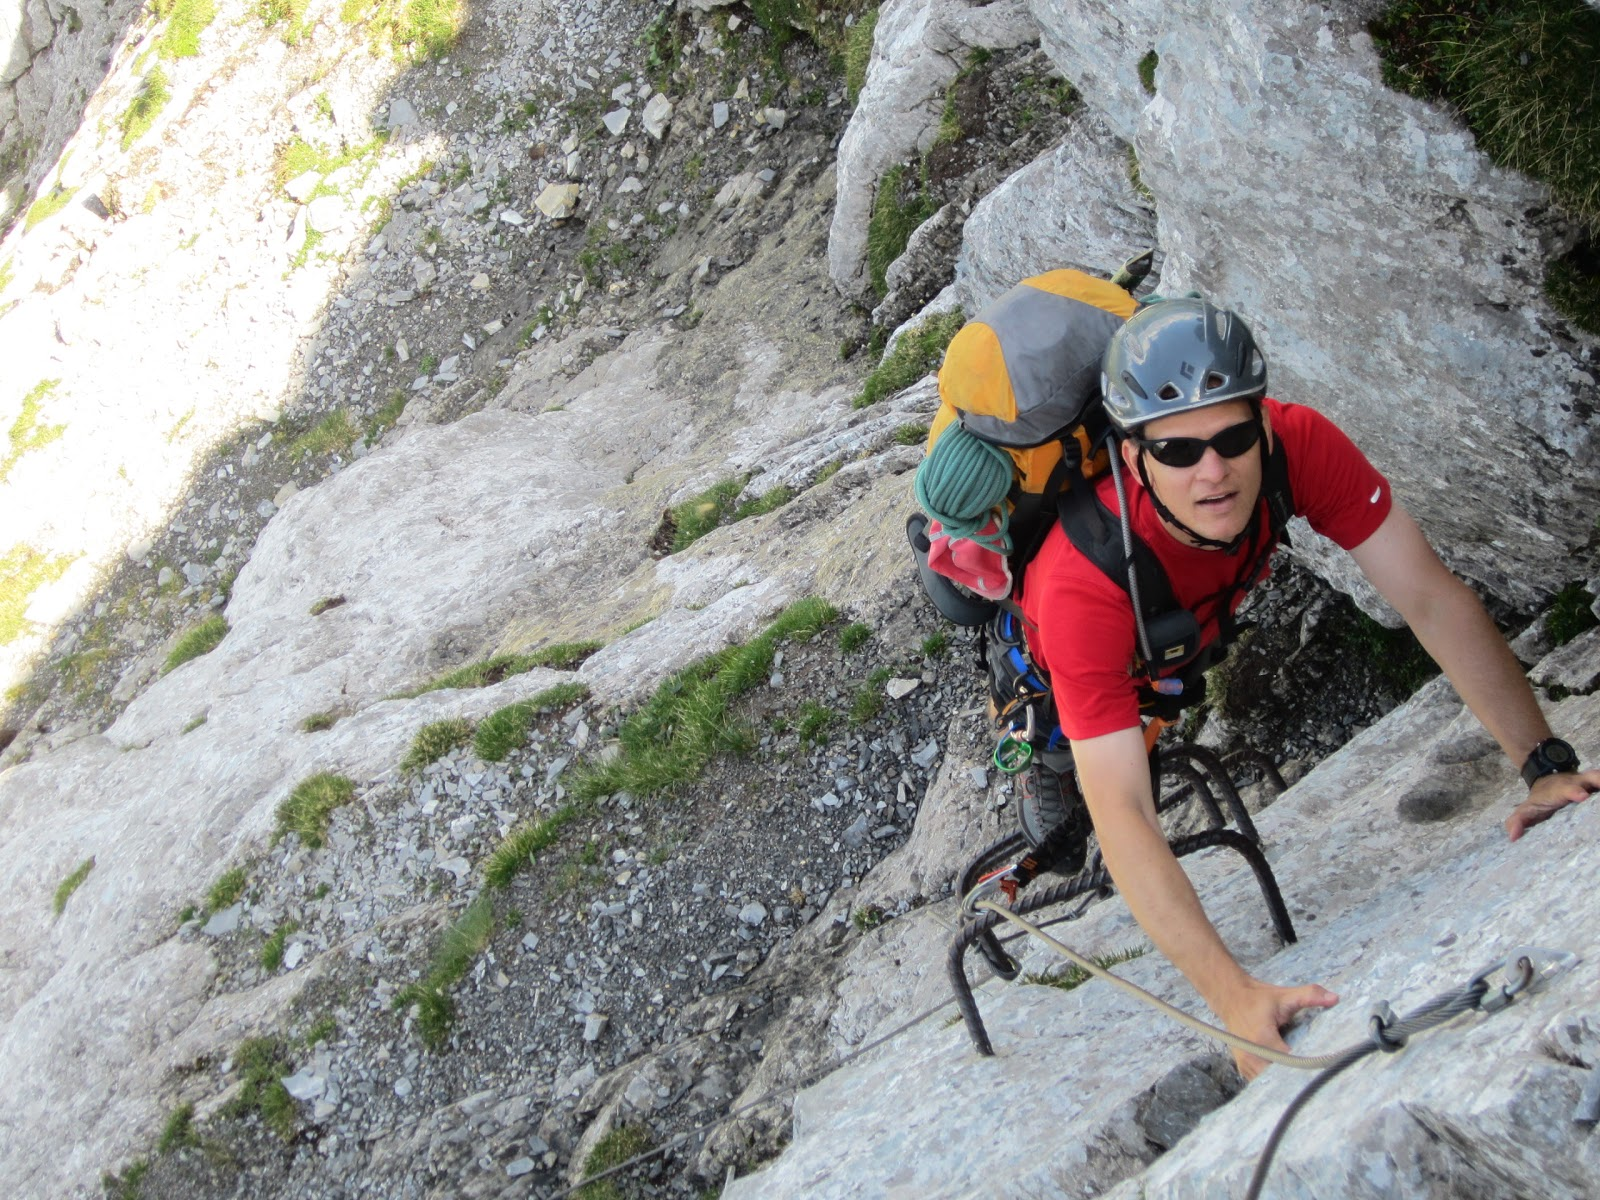 Climbing Trip Reports: July 2013.